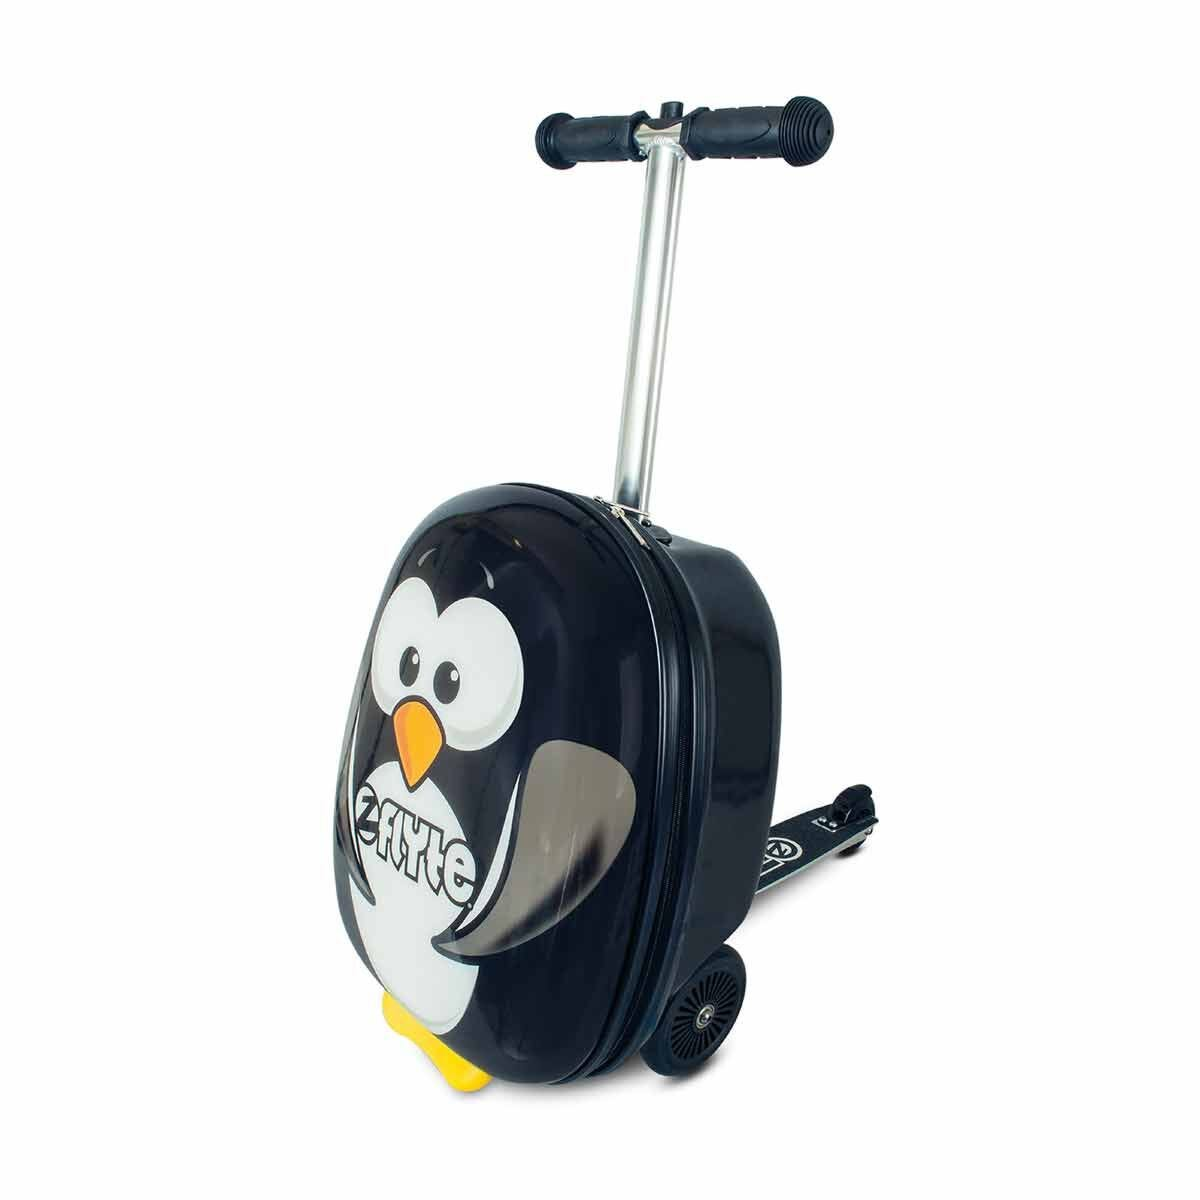 Zinc Flyte Percy the Penguin Scooter Case 25L